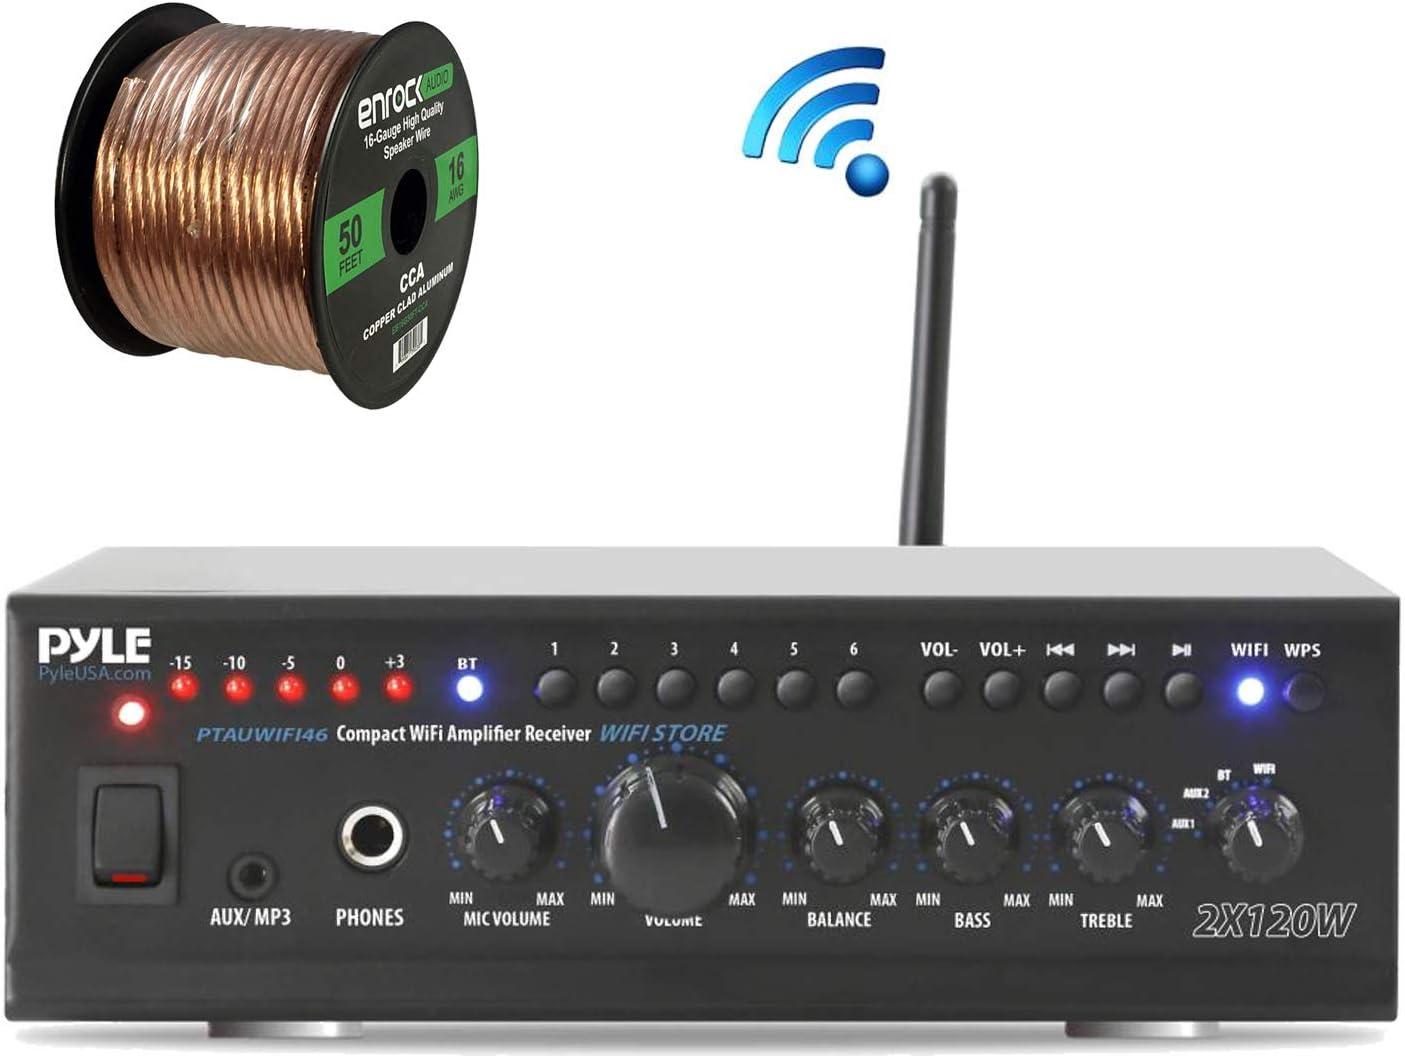 Pyle PTAUWIFI46 WiFi Bluetooth Stereo Amplifier 240-Watt Home Theatre Receiver, Enrock Audio Spool of 50 Foot 16-Gauge Speaker Wire (No Speaker)